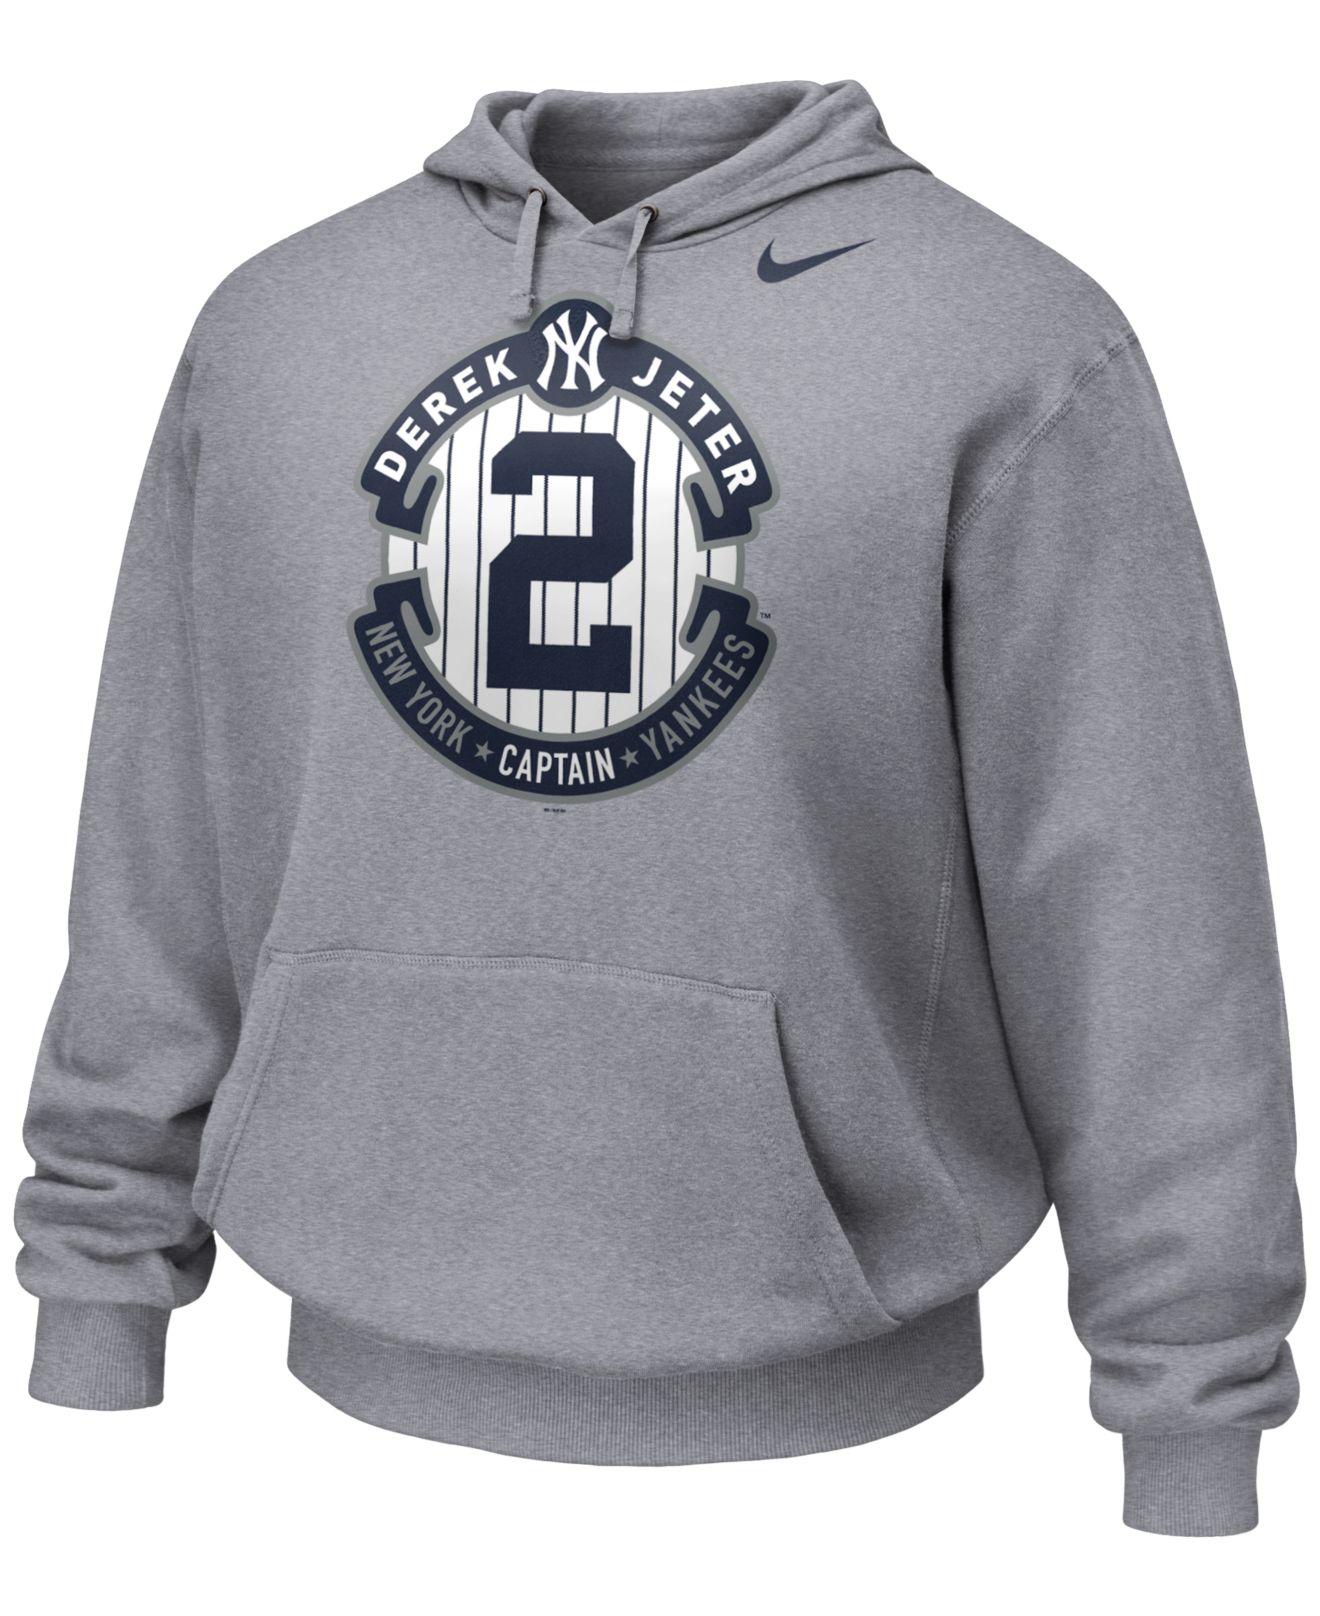 3cb552c5458 Nike Men'S Derek Jeter Commemorative Therma-Fit Hoodie in Gray for ...